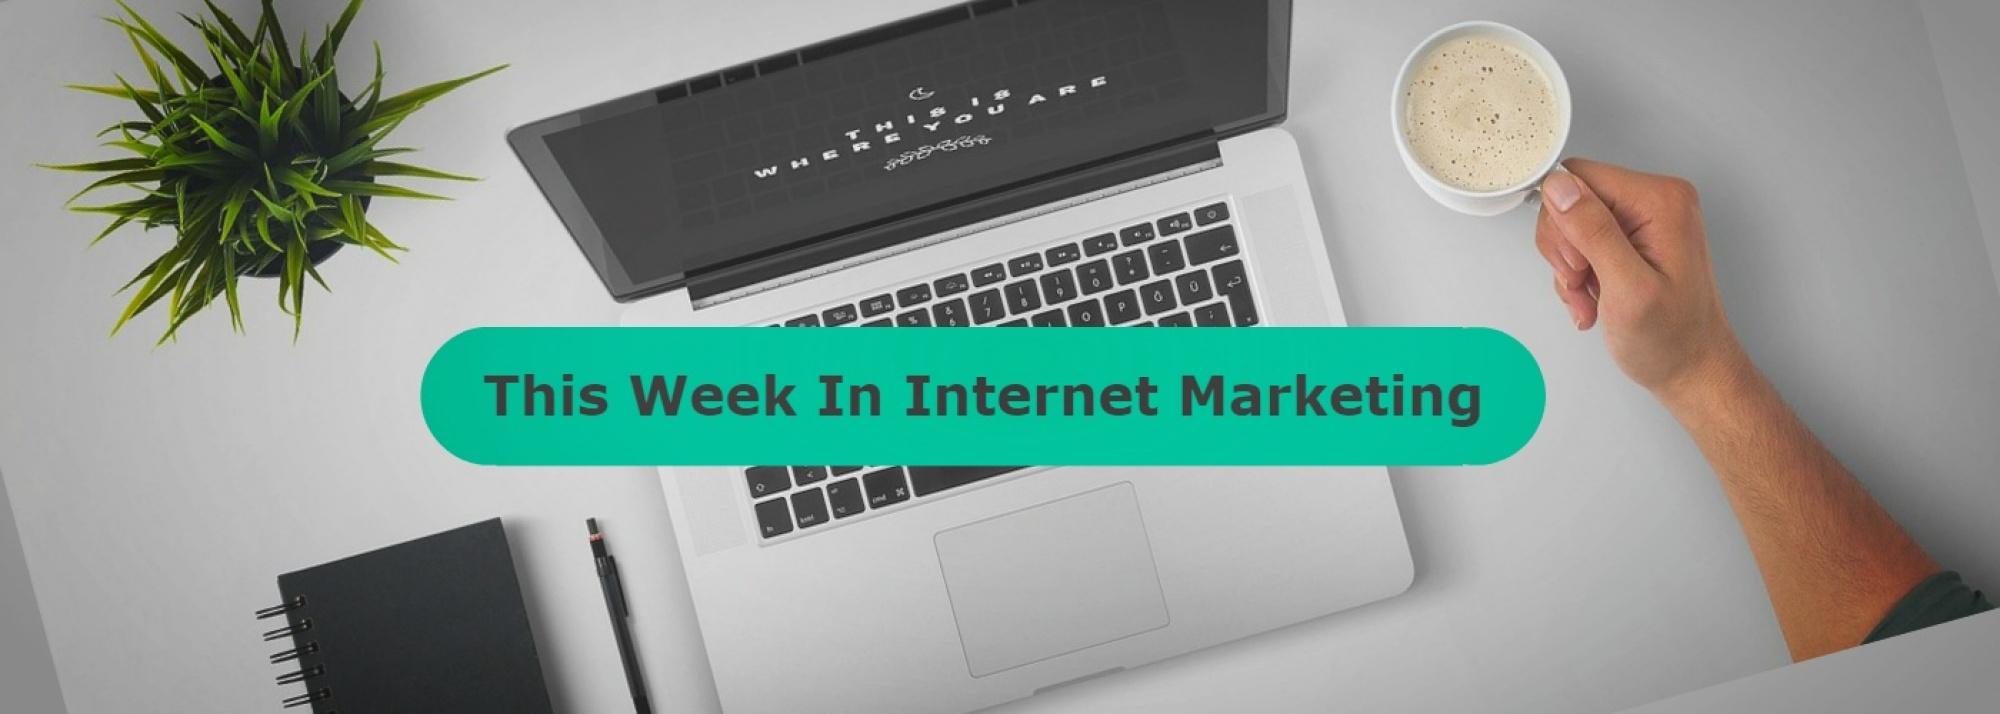 This Week In Internet Marketing